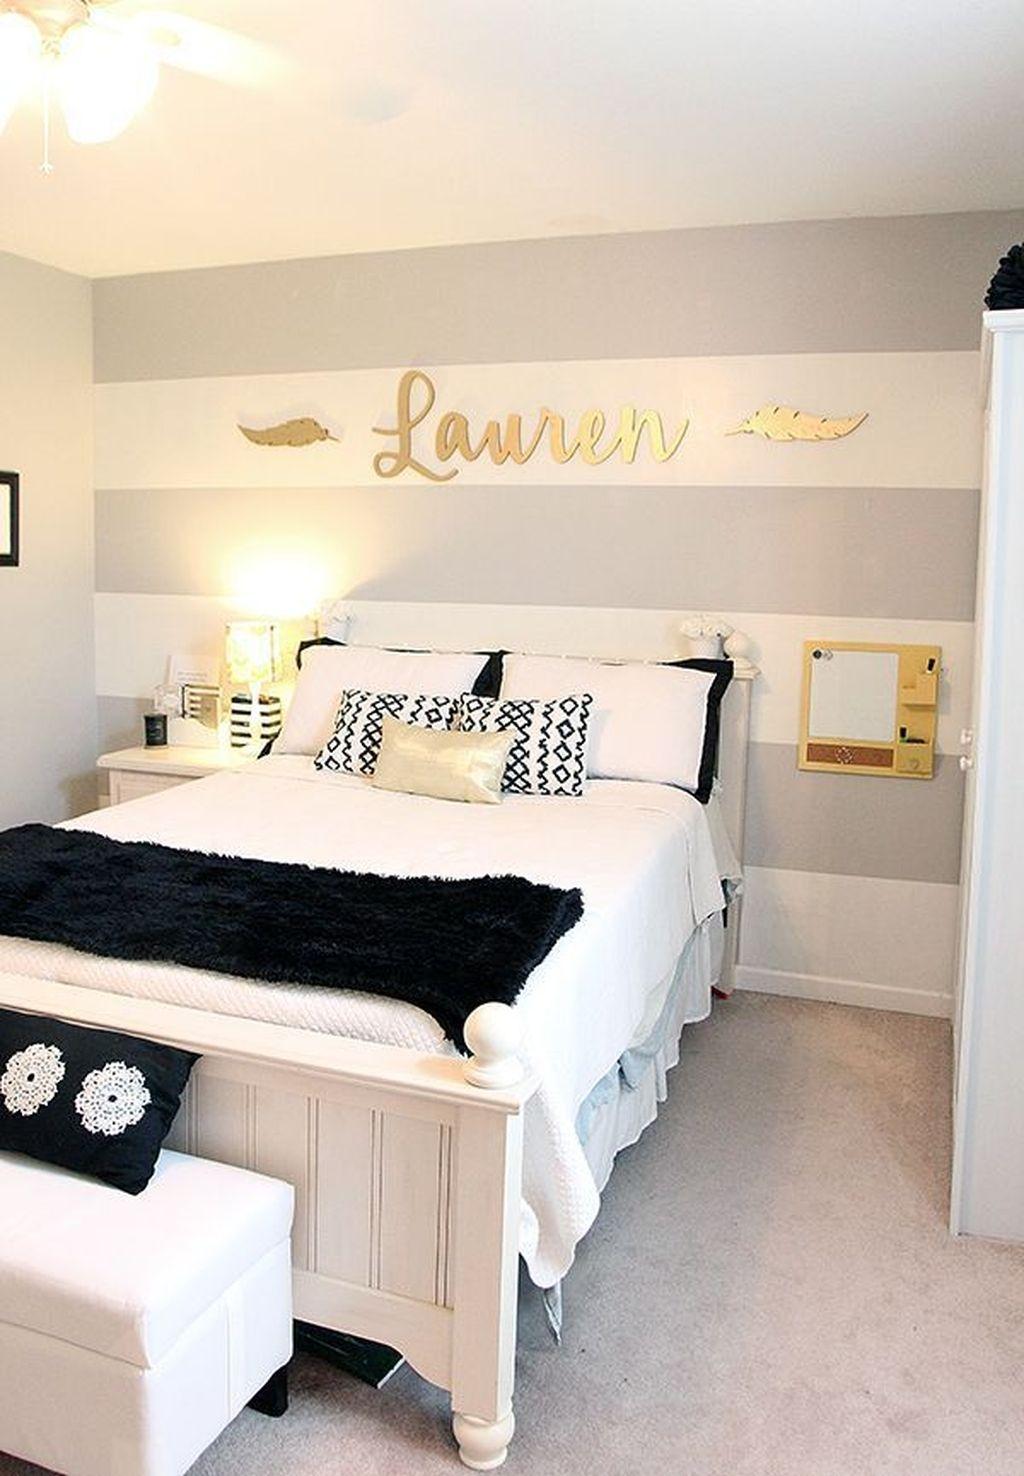 39 Wonderful Girls Room Design Ideas29